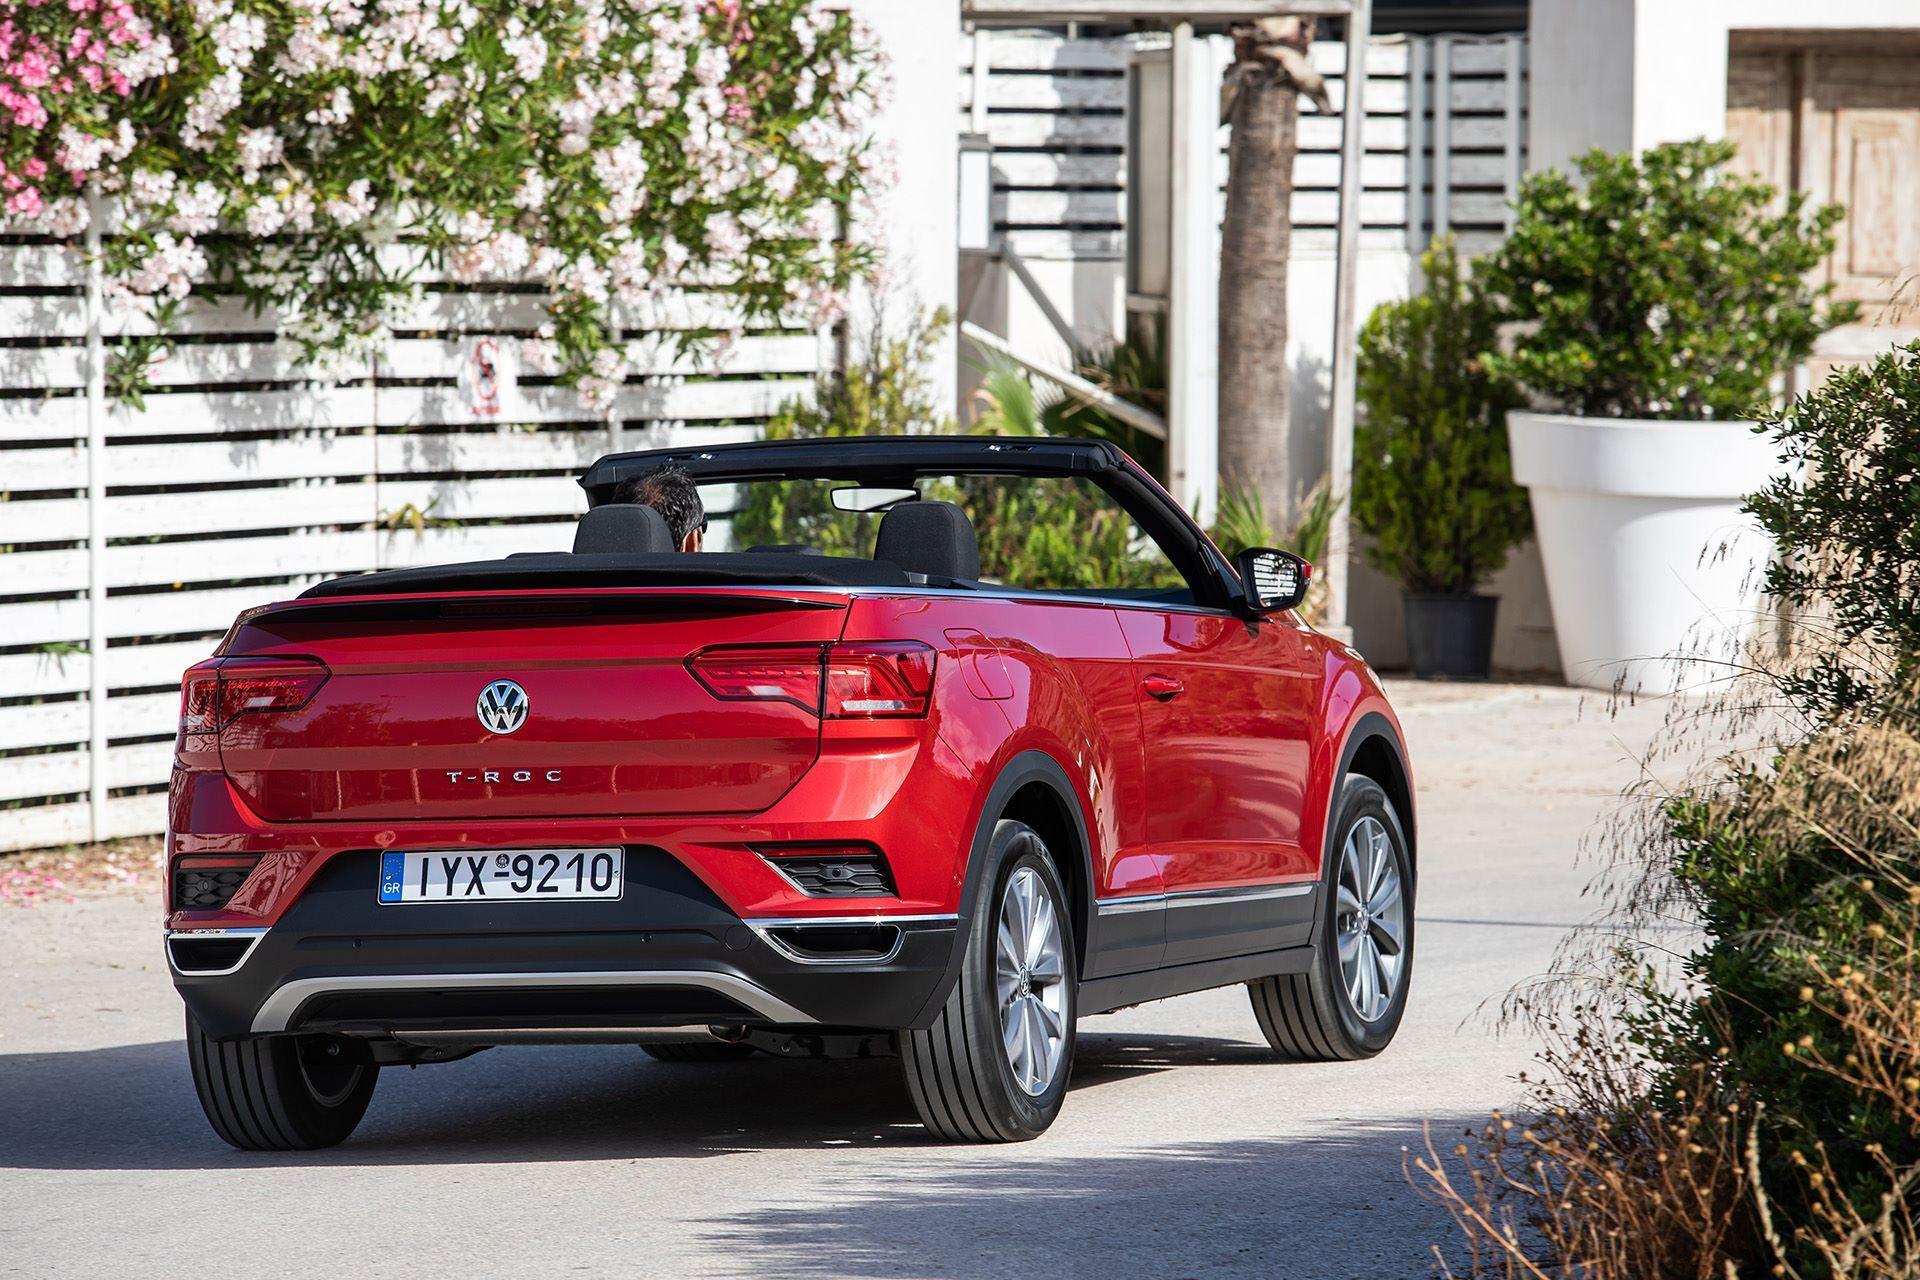 Volkswagen-T-Roc-Cabriolet-Greece-31